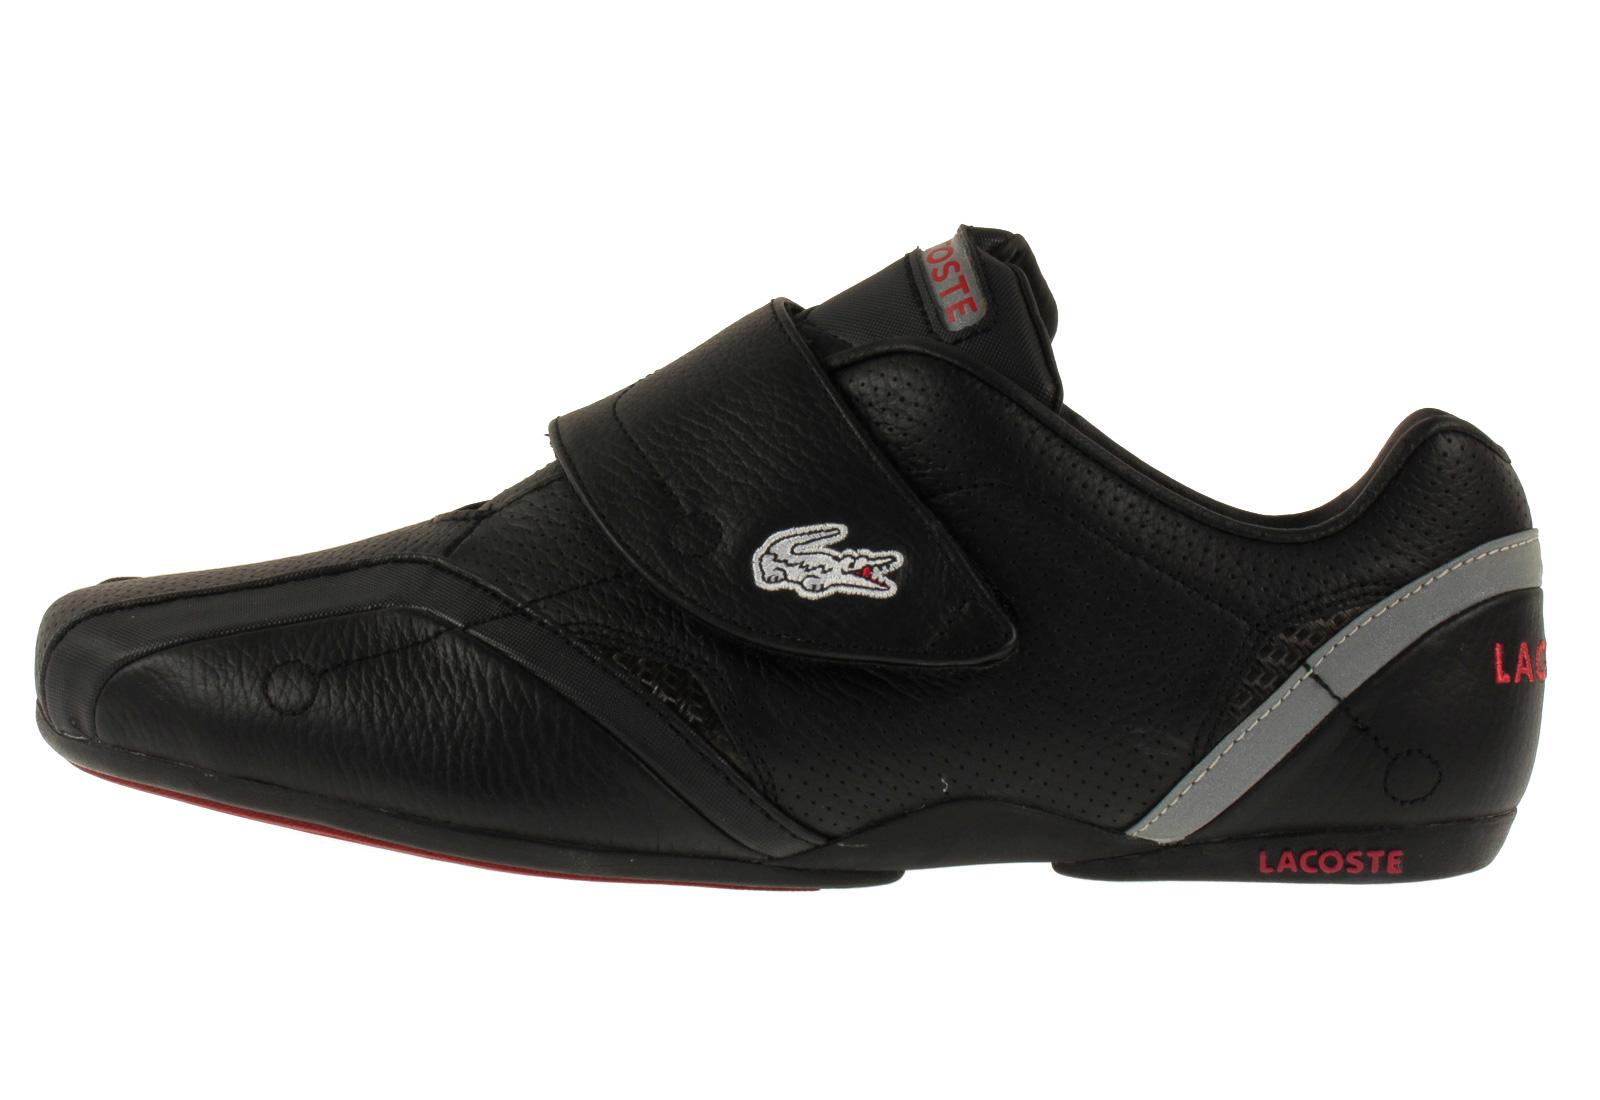 Lacoste Cipő - Protect - 13S-4027-1B5 - Office Shoes Magyarország 3ce1134979